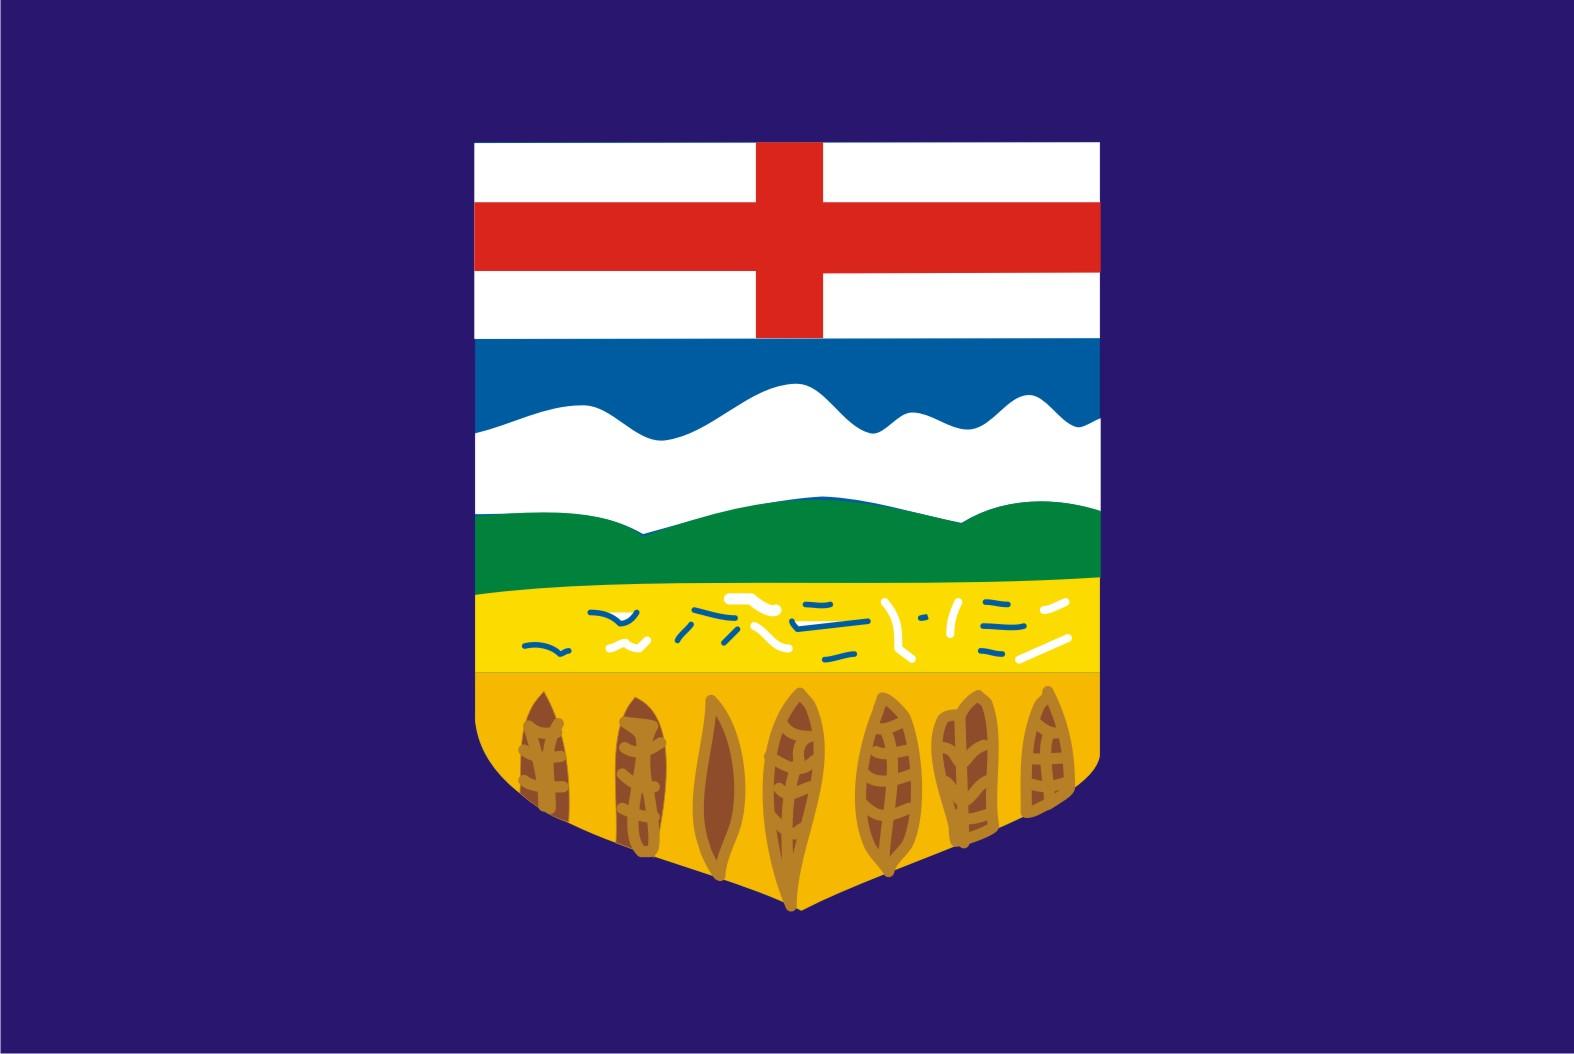 Bendera provinsi dan territori kanada